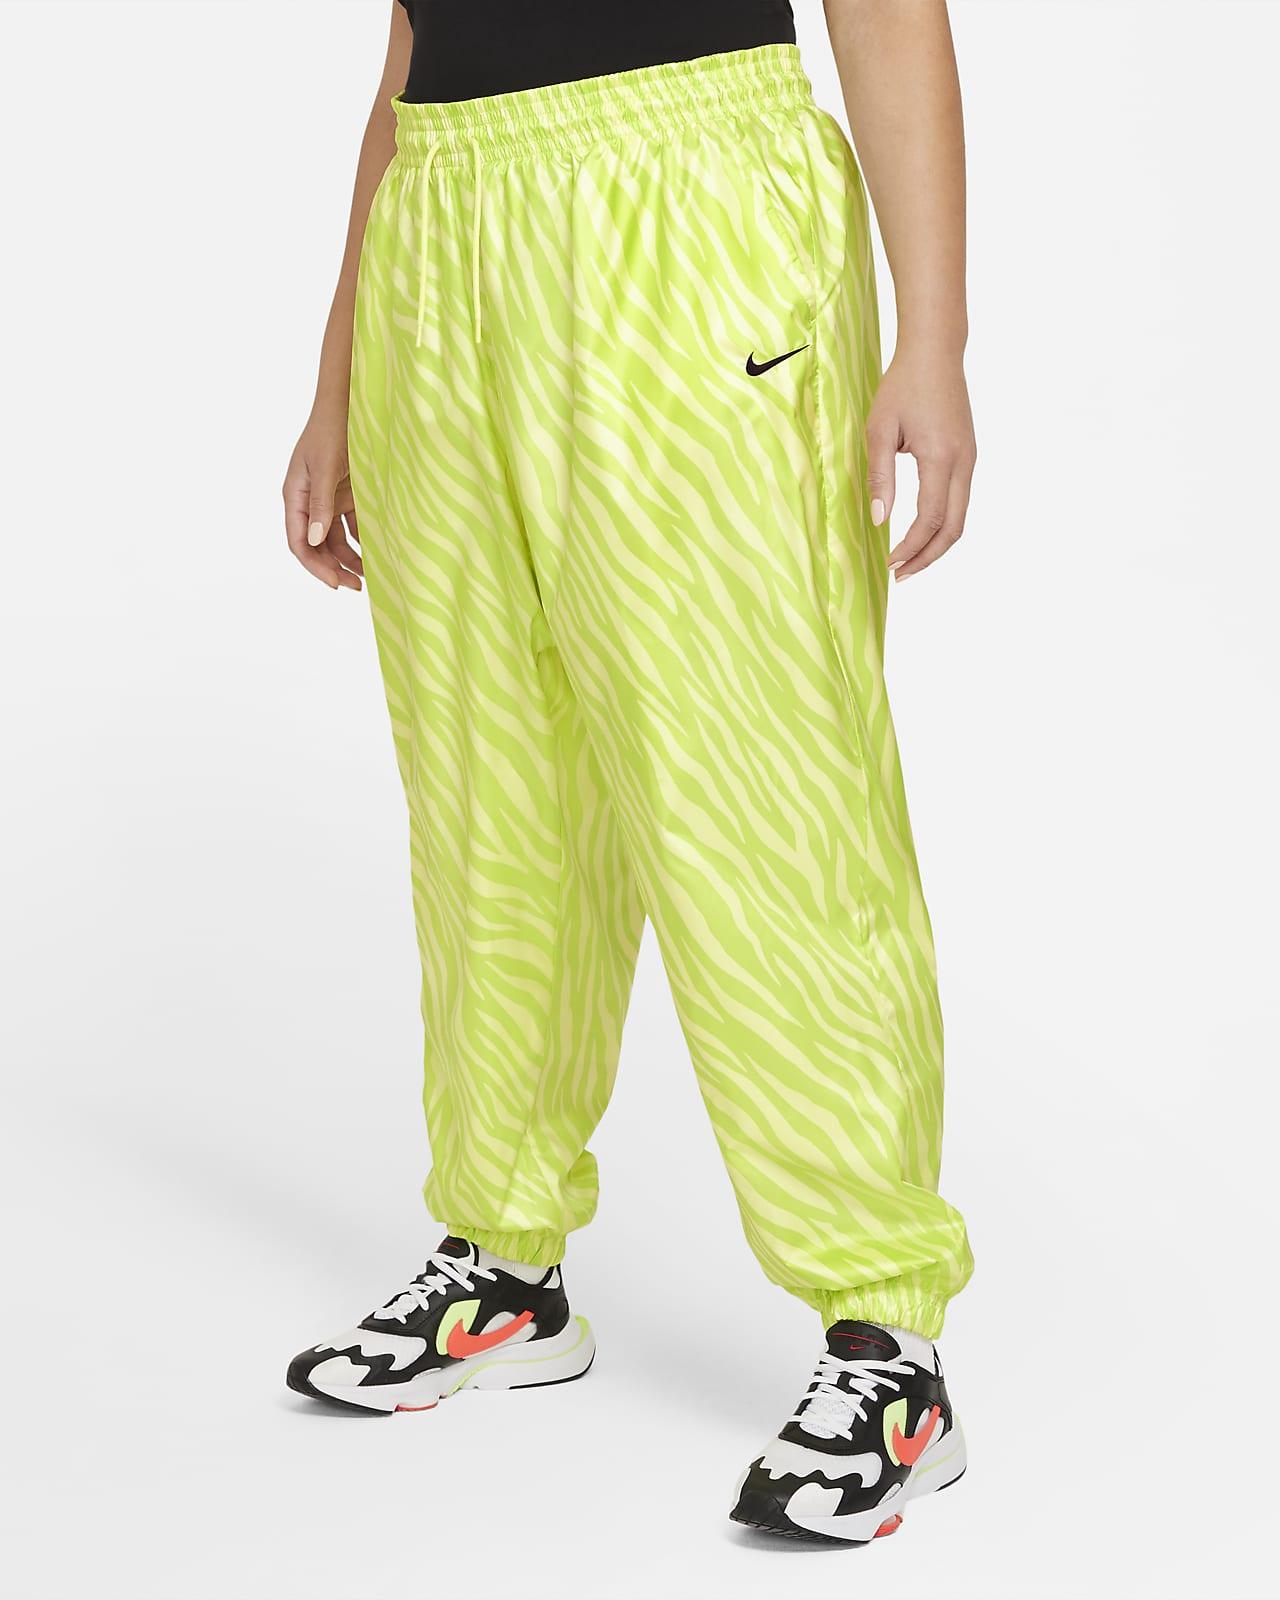 Pantalones para mujer talla grande Nike Sportswear Icon Clash